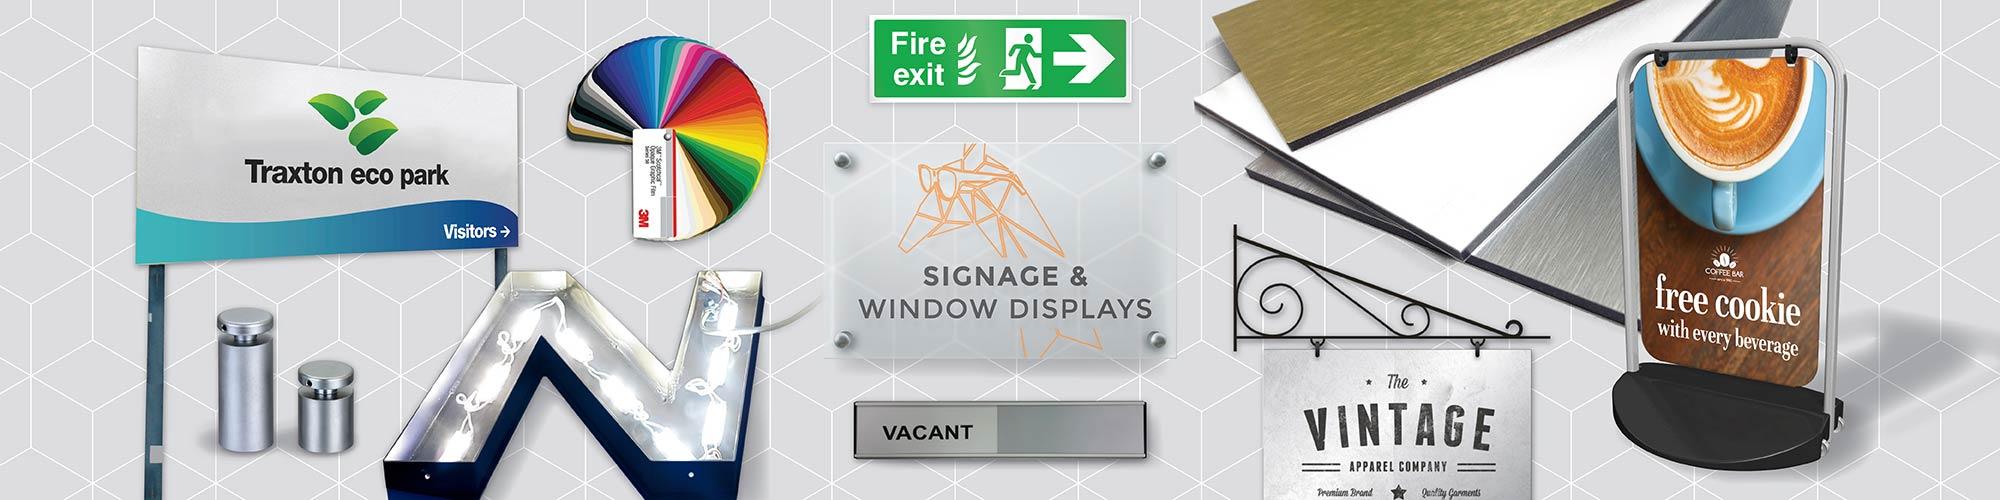 Signage & Window Displays